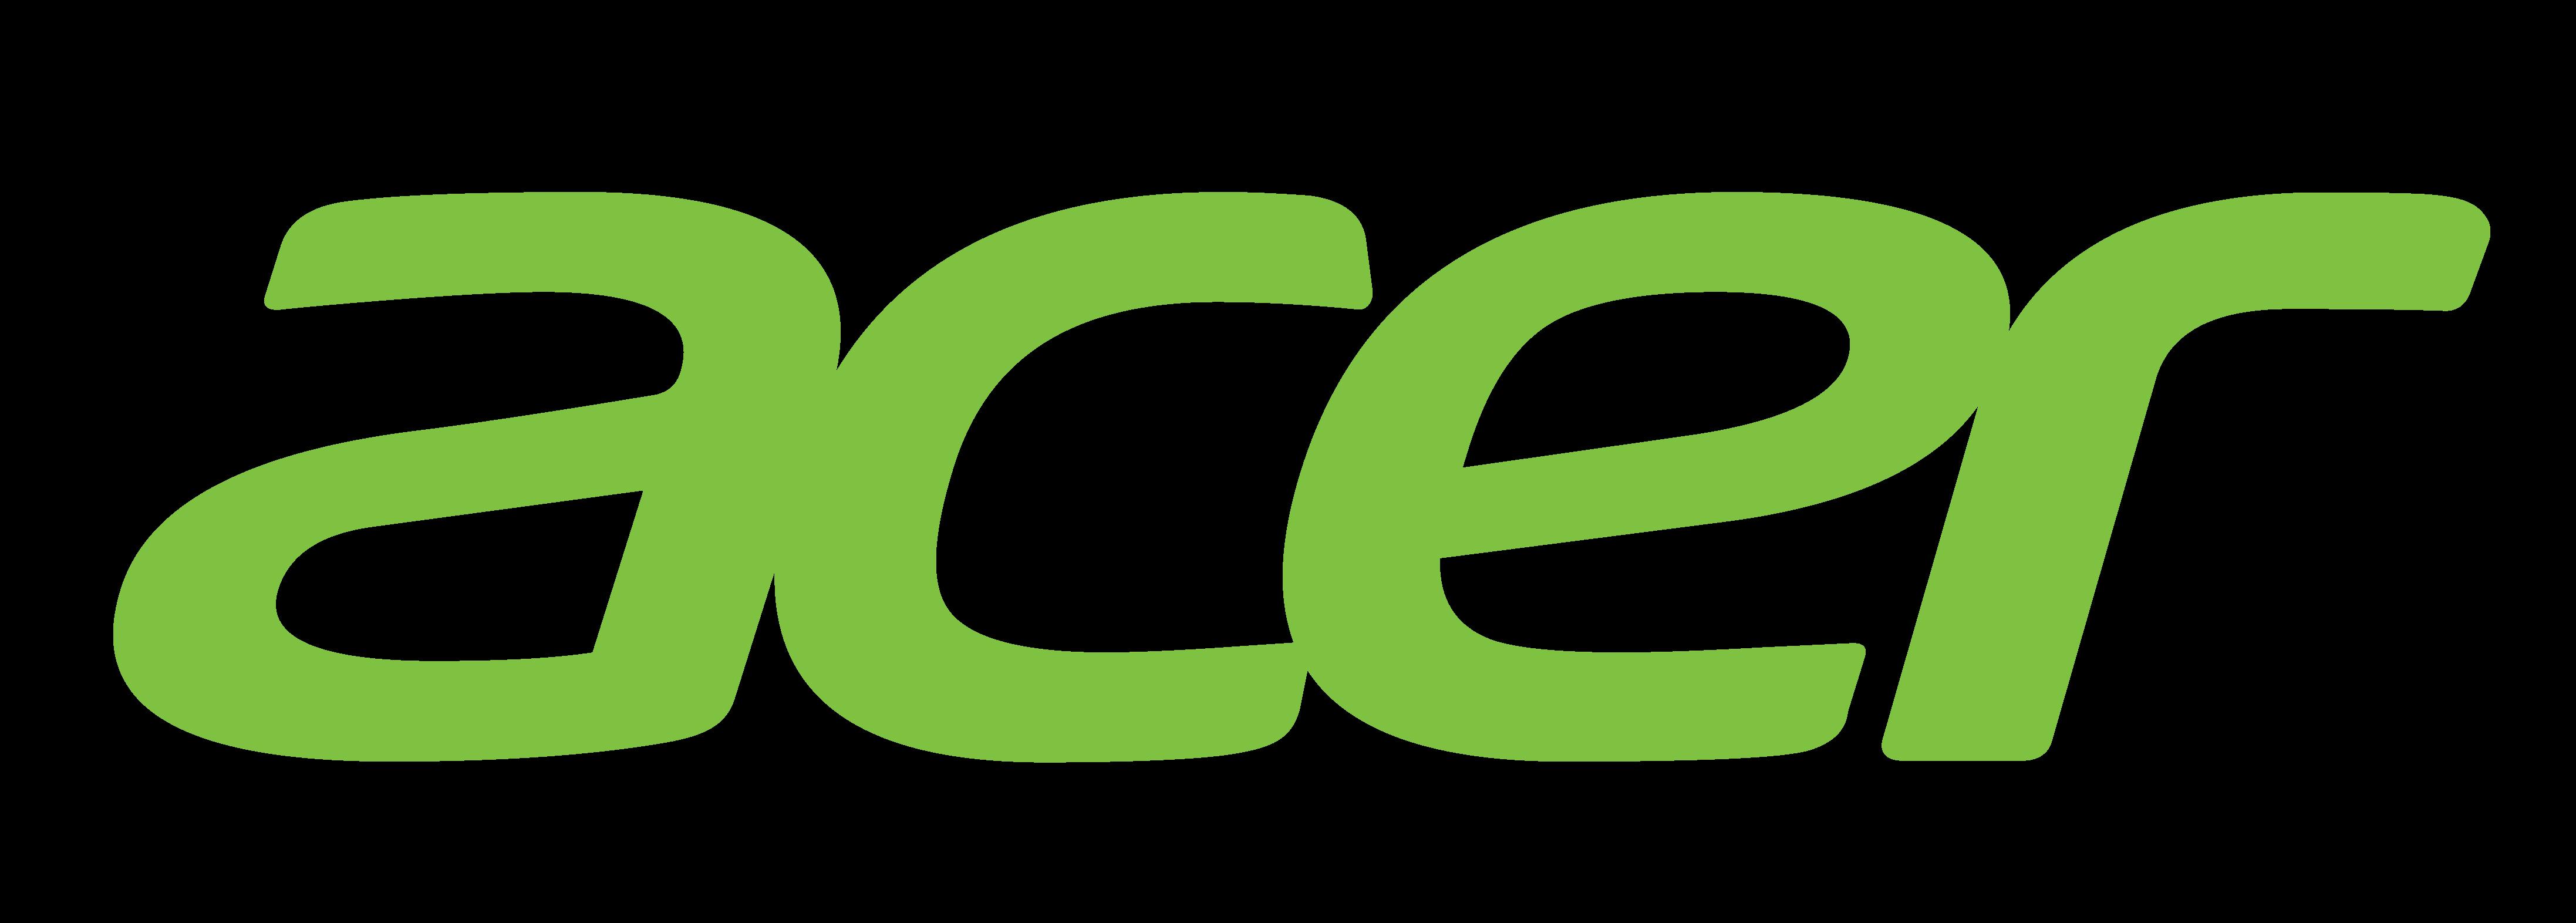 Logo Acer